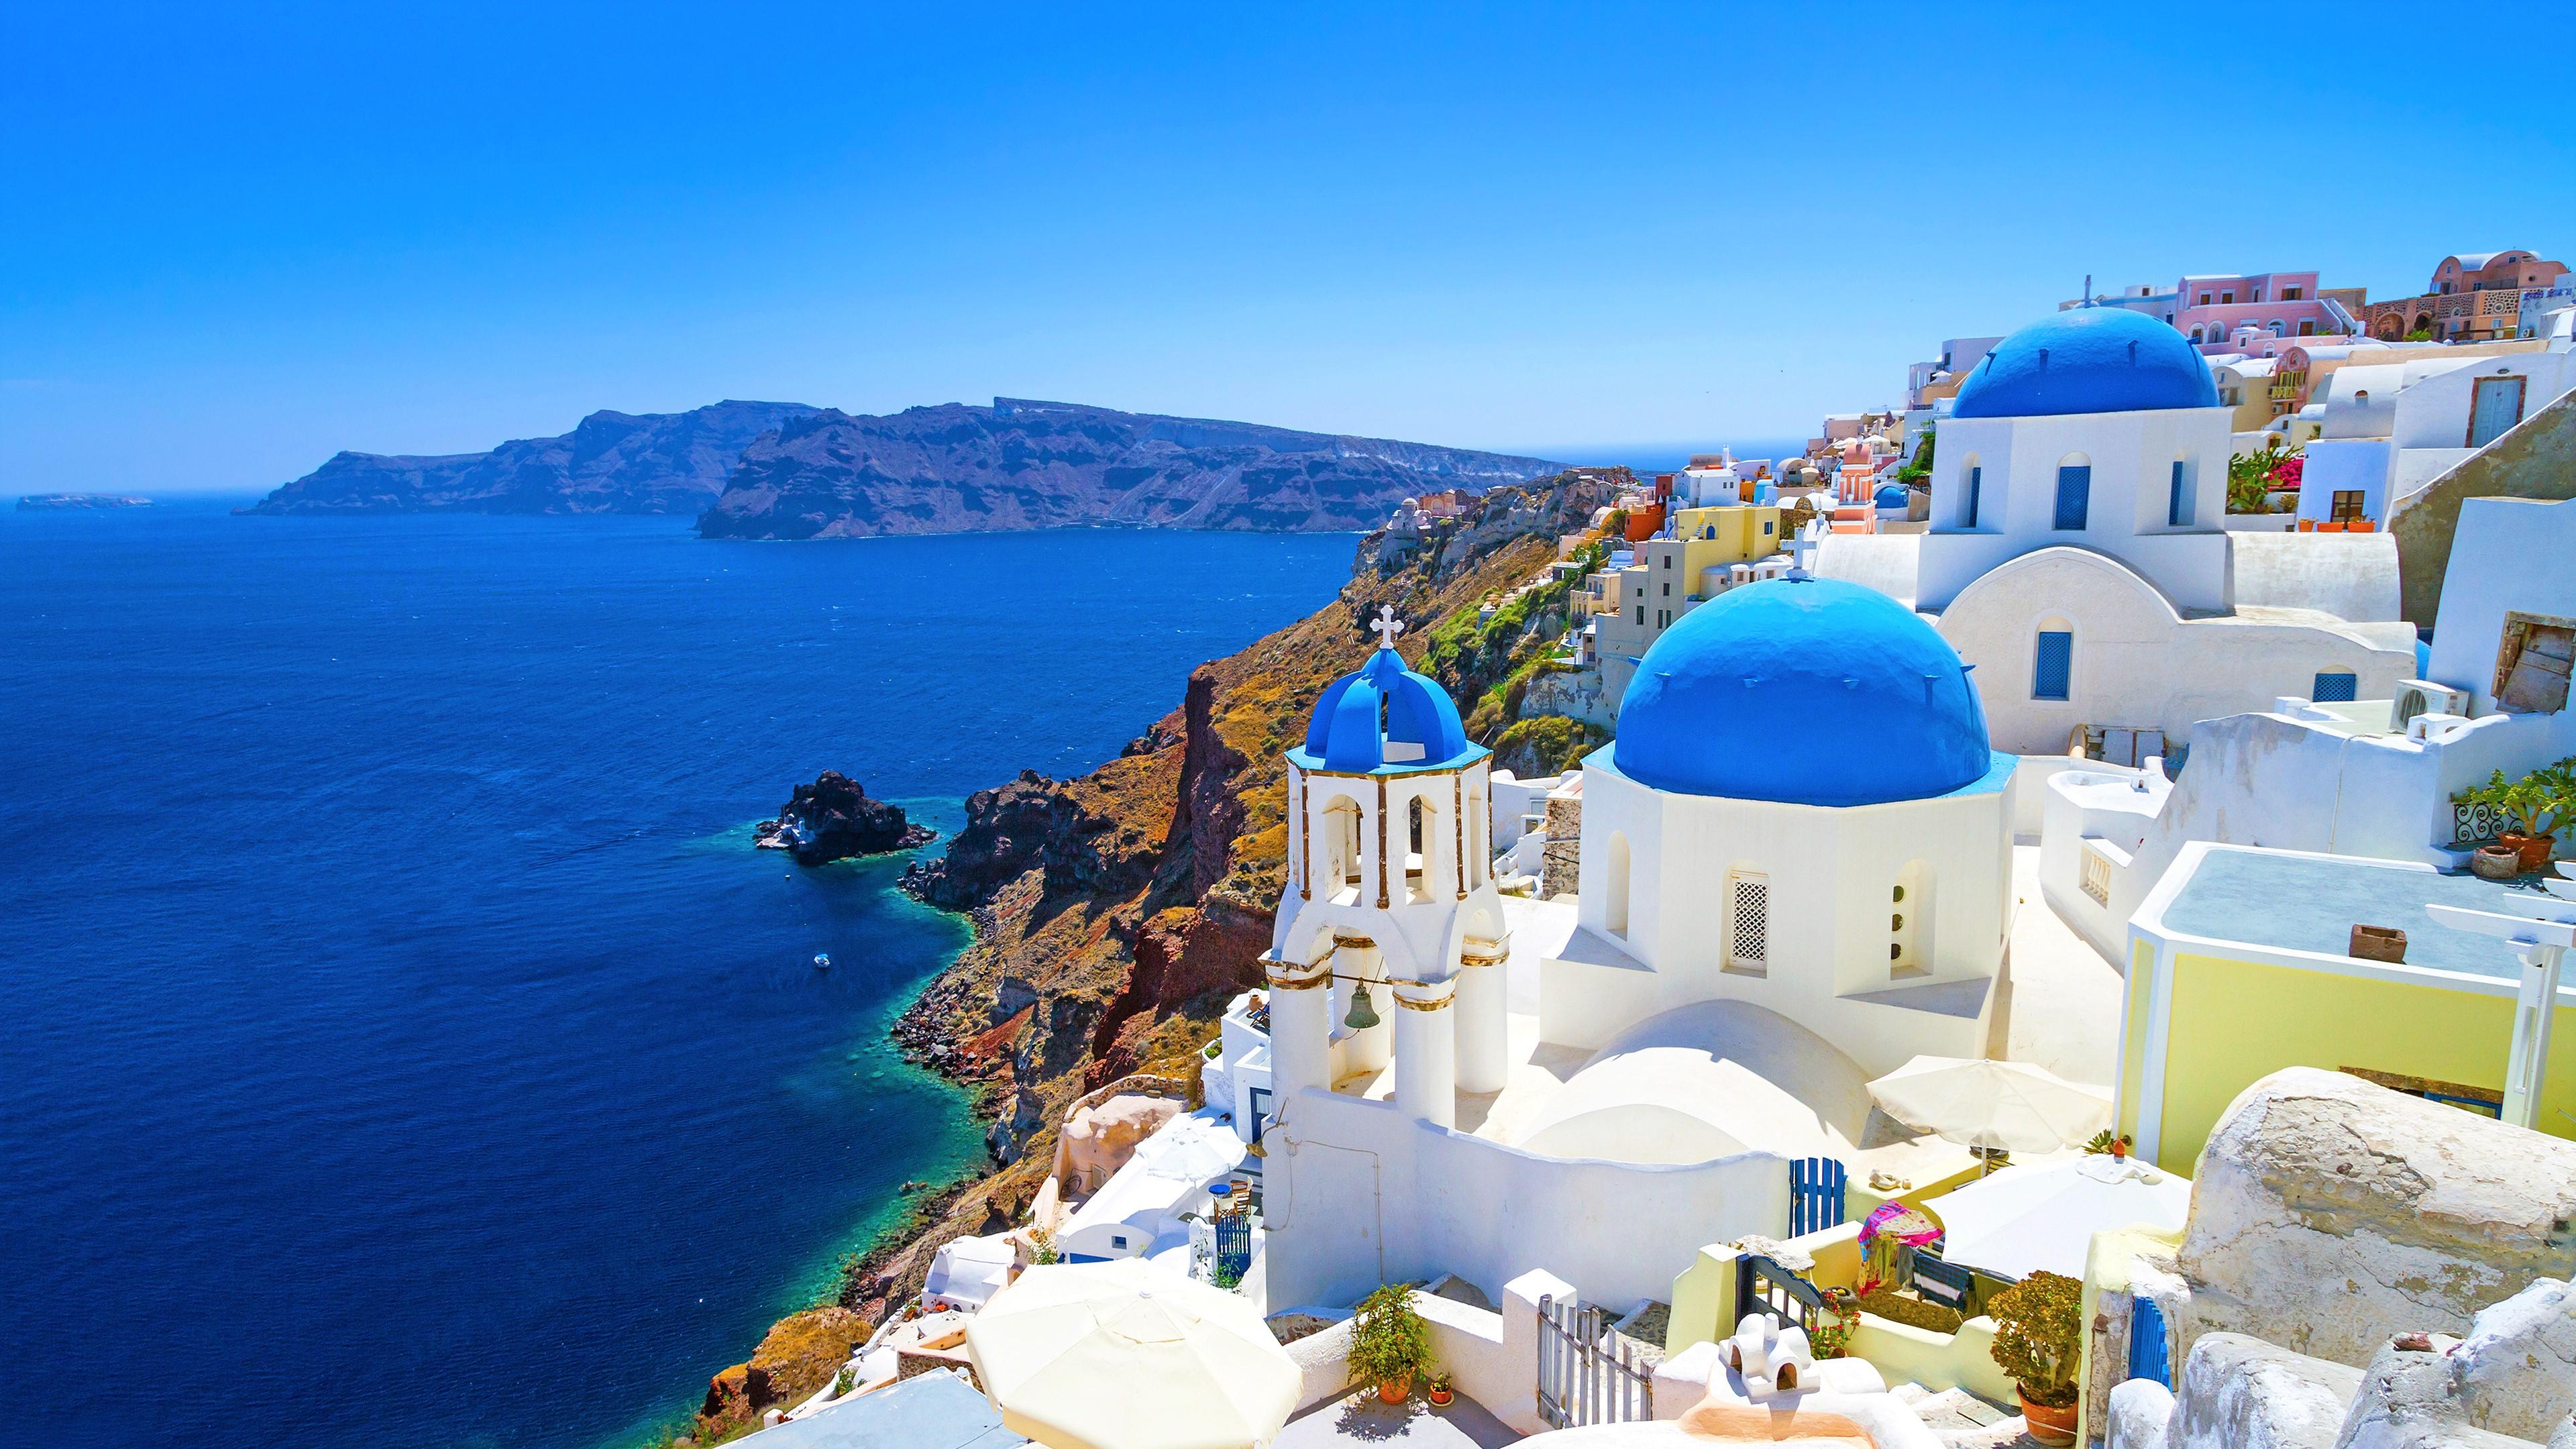 Santorini Greece 4k Ultra HD Wallpaper